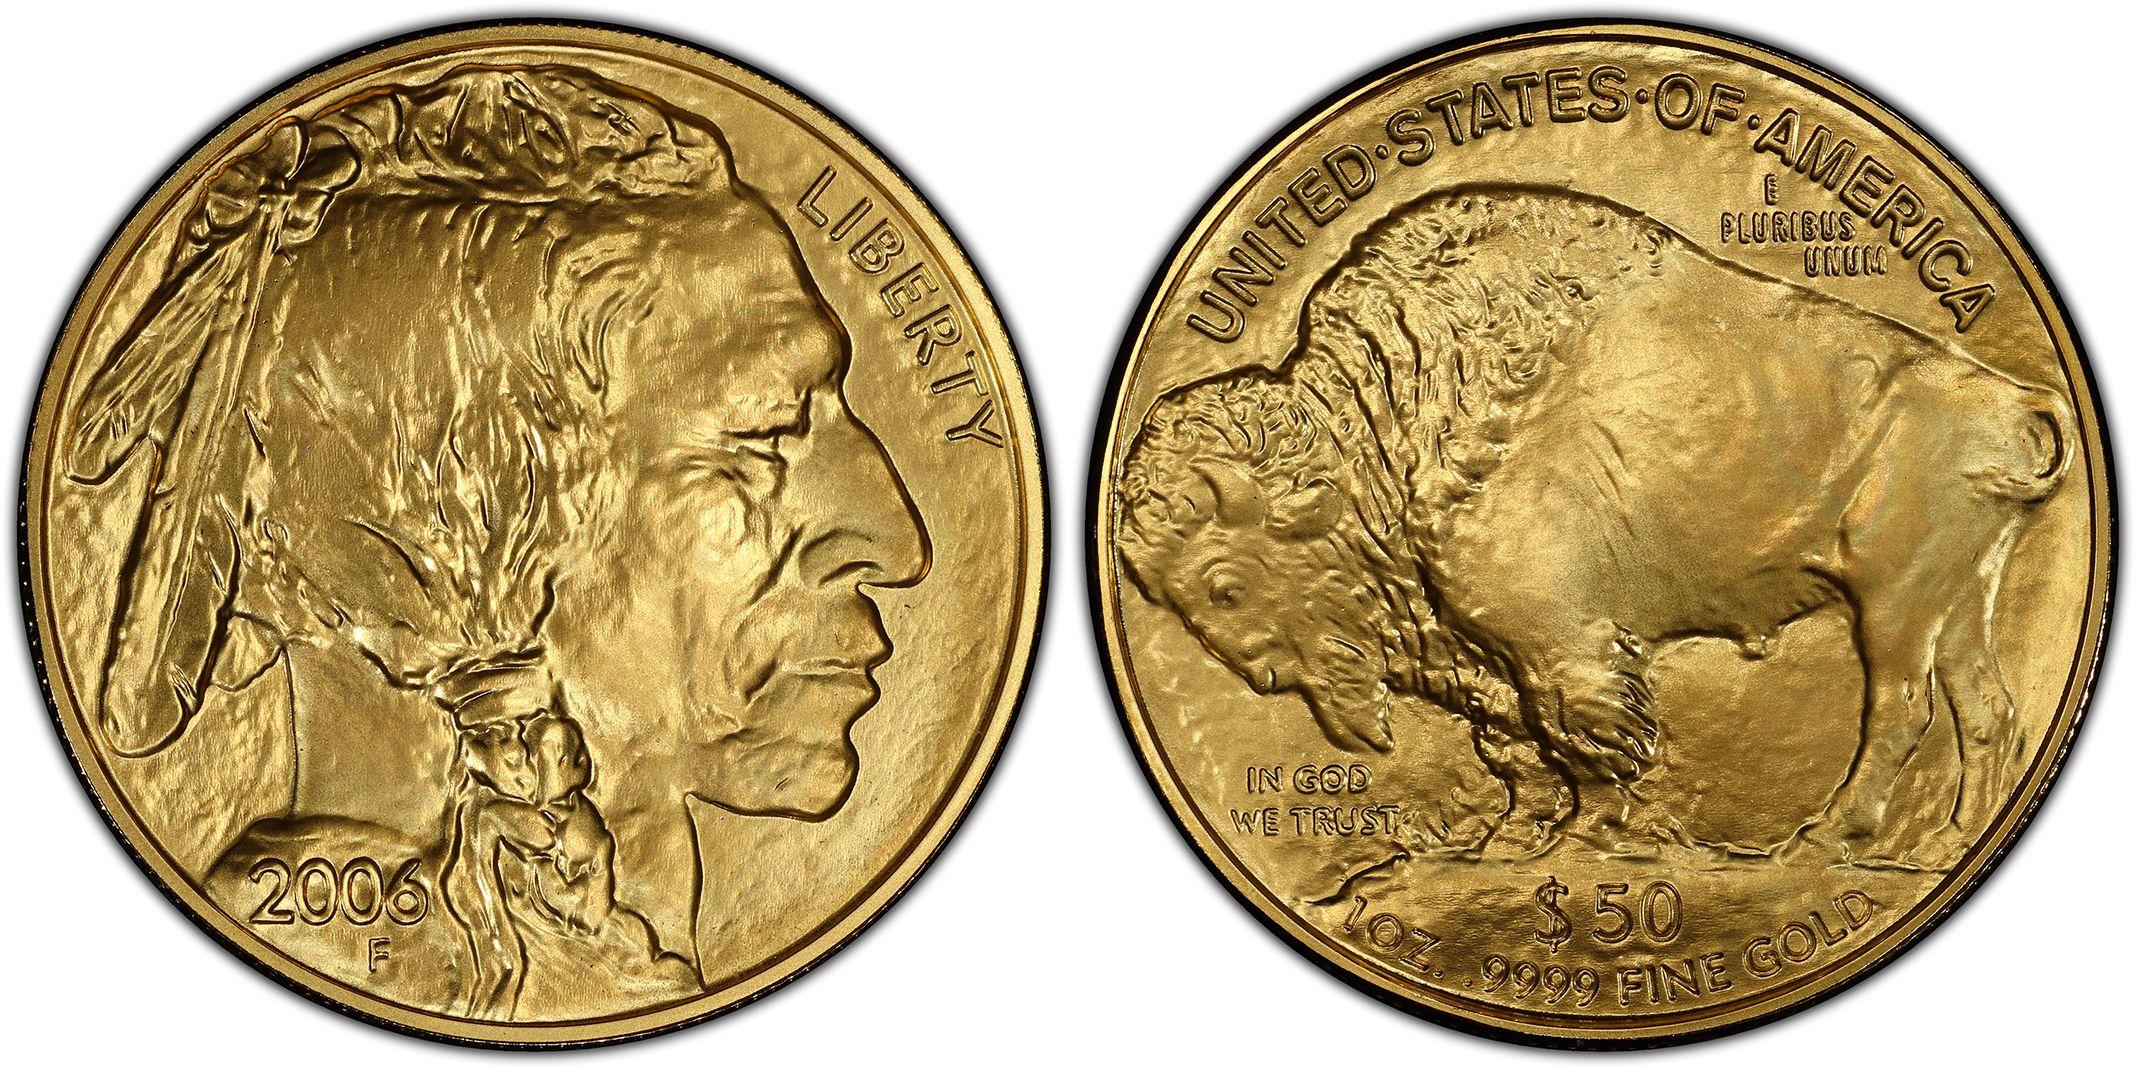 2006 50 American Buffalo 9999 Fine Gold Regular Strike Gold Buffalos Pcgs Coinfacts Gold Bullion Bullion Coins Gold Coins